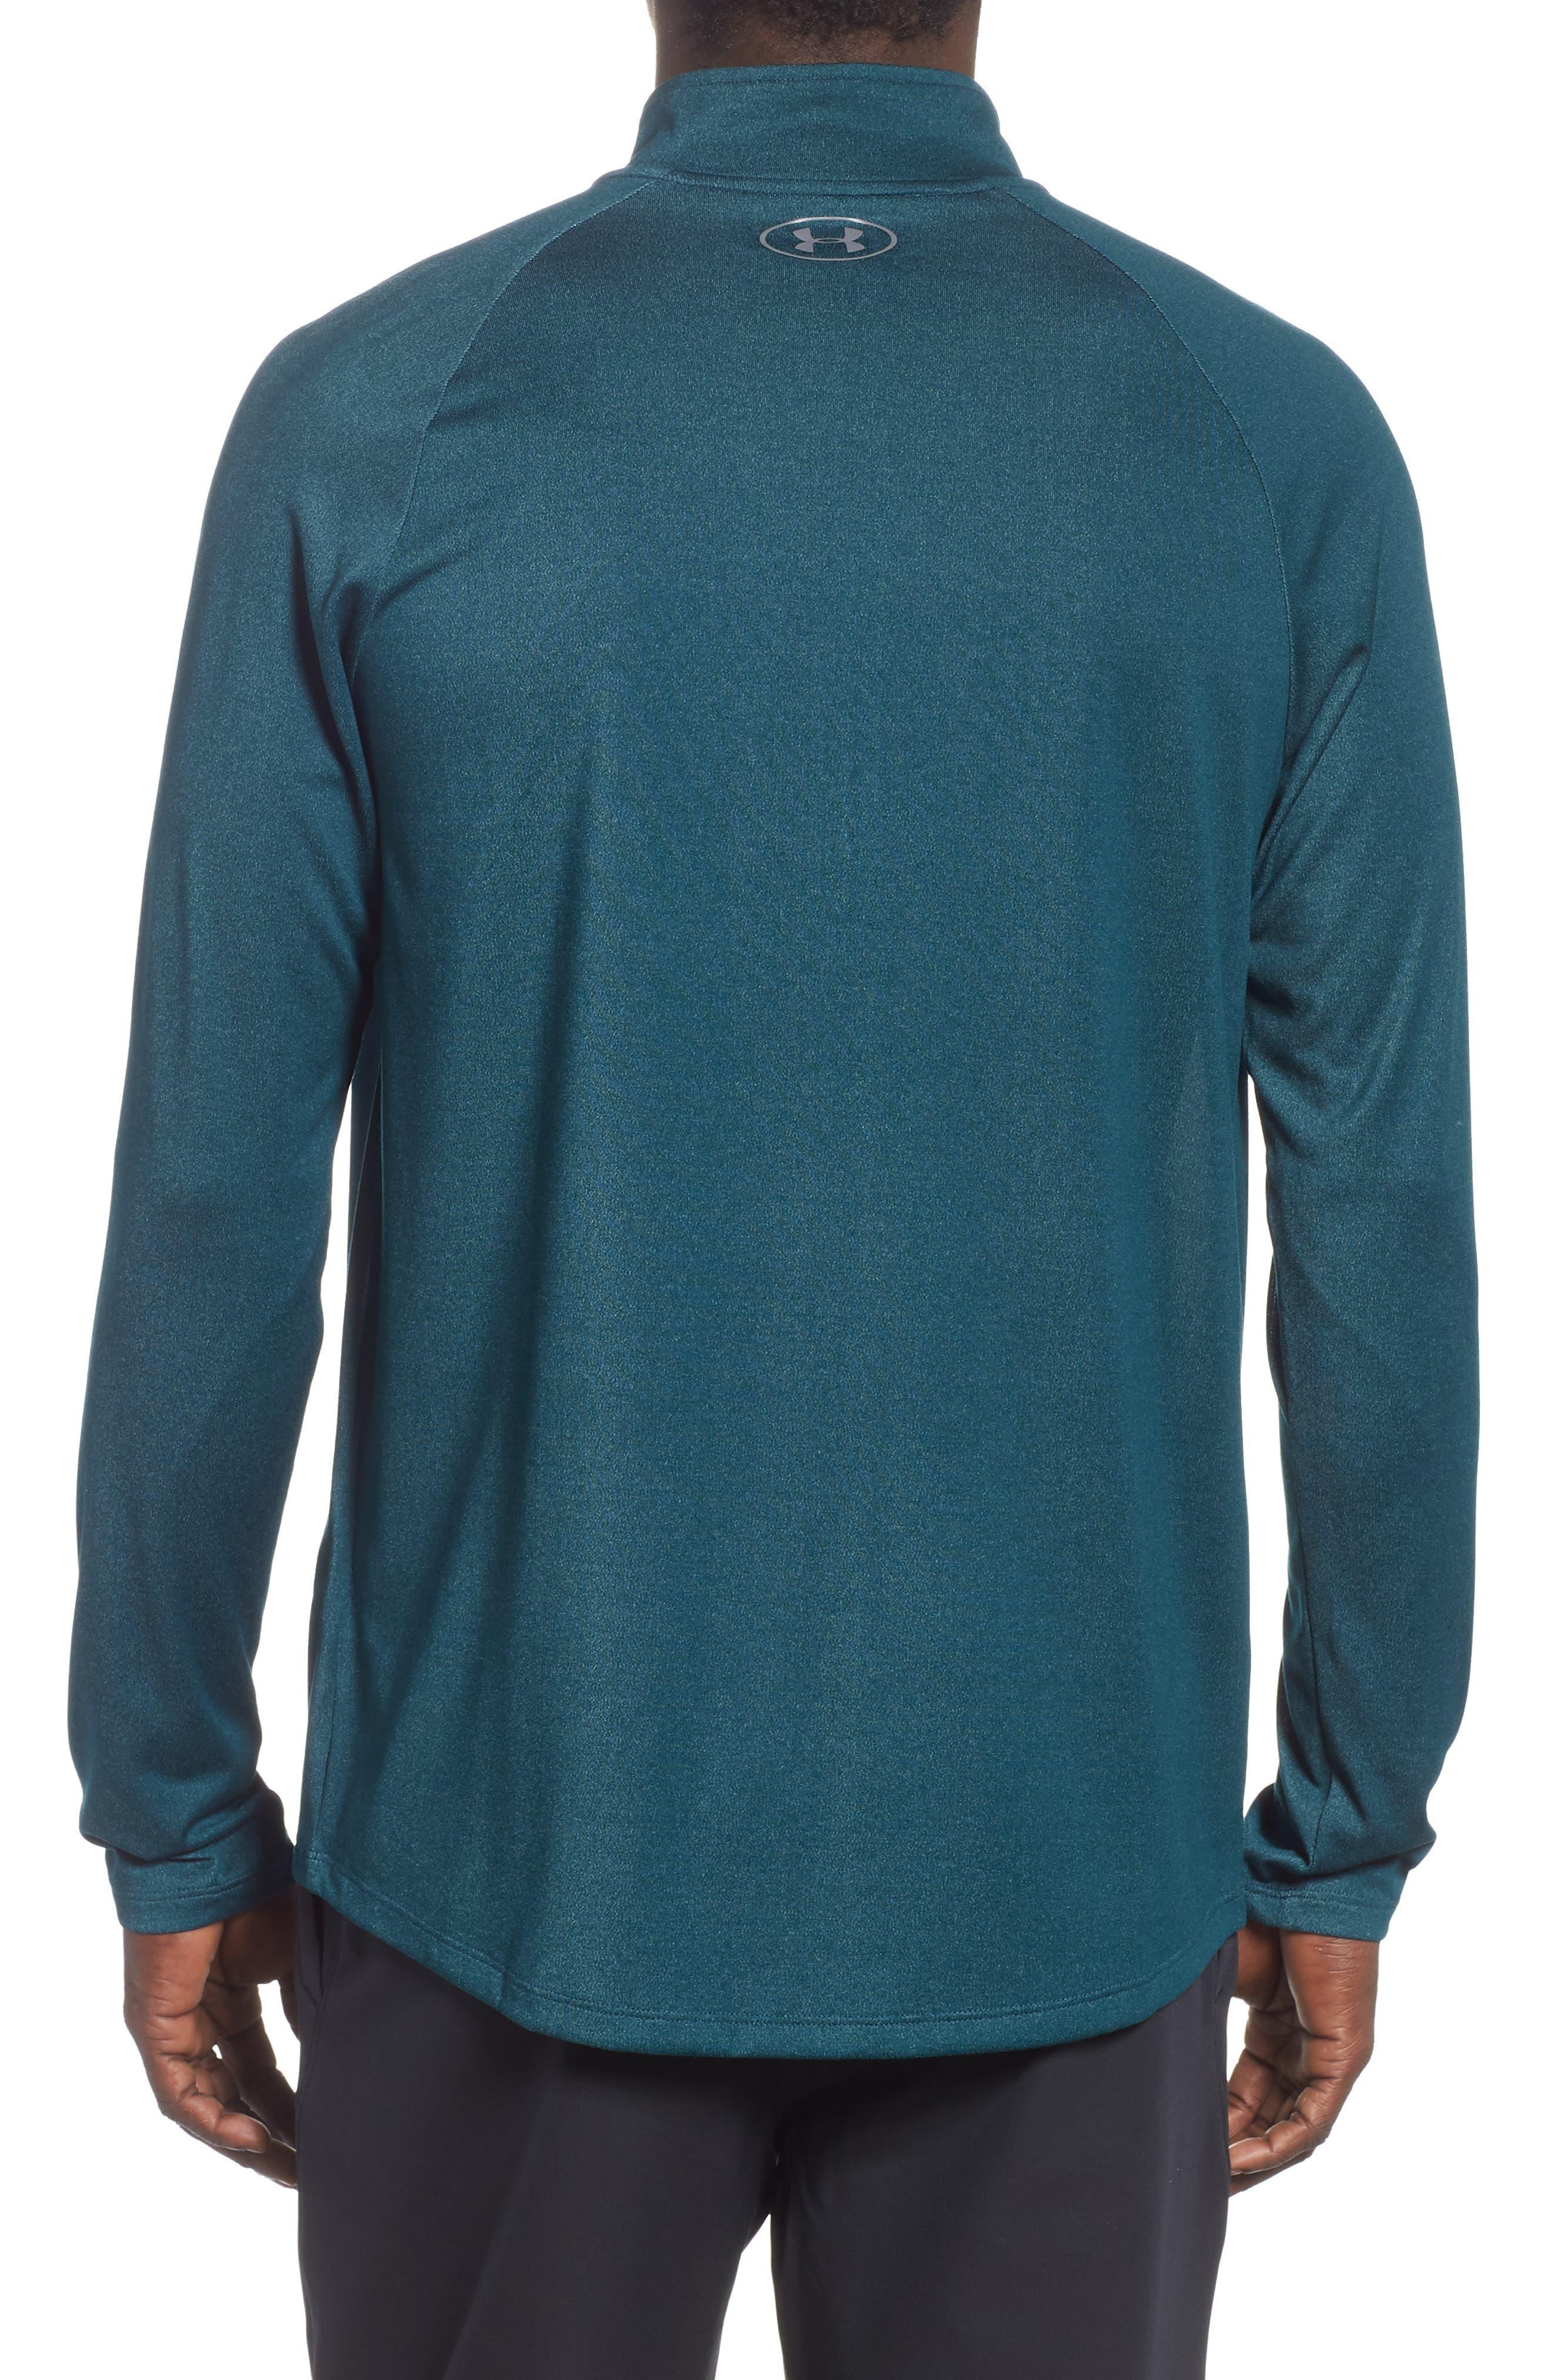 Tech Half Zip Sweatshirt,                             Alternate thumbnail 2, color,                             TEAL